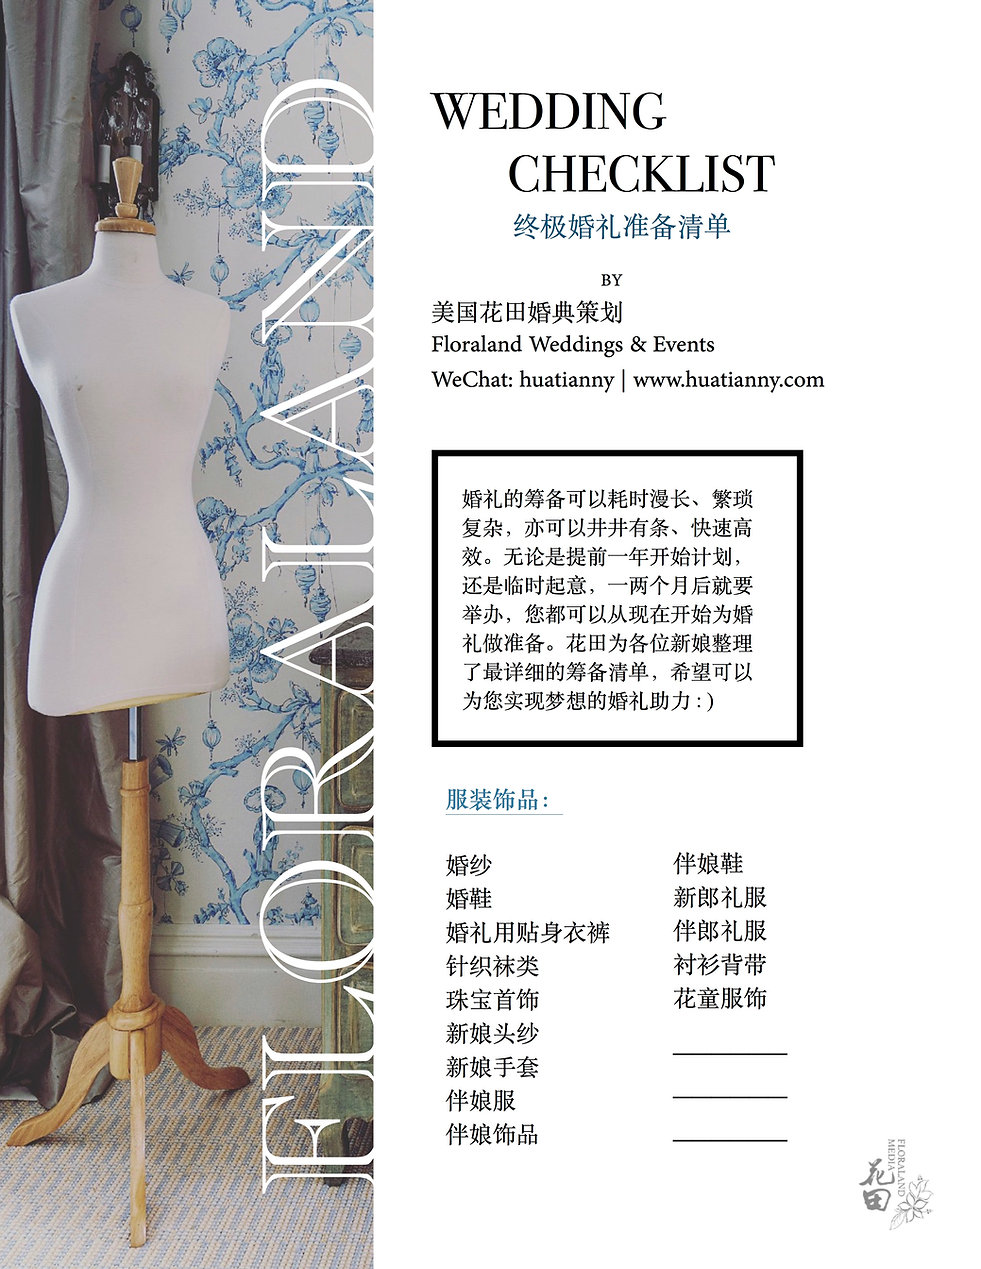 花田婚礼checklist1.jpg